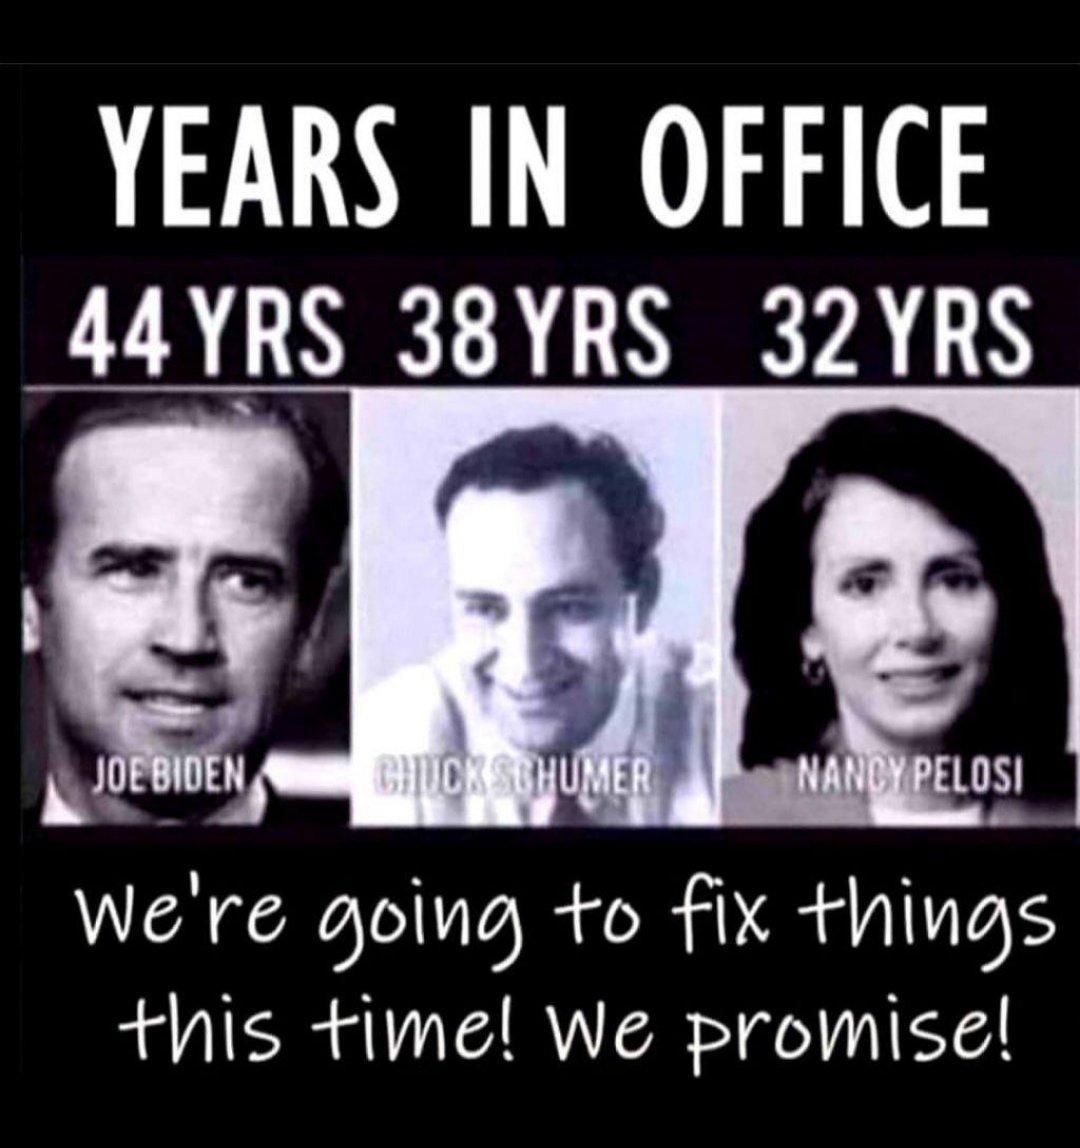 #ImpeachBidenNow #ImpeachmentDay #fridaymorning